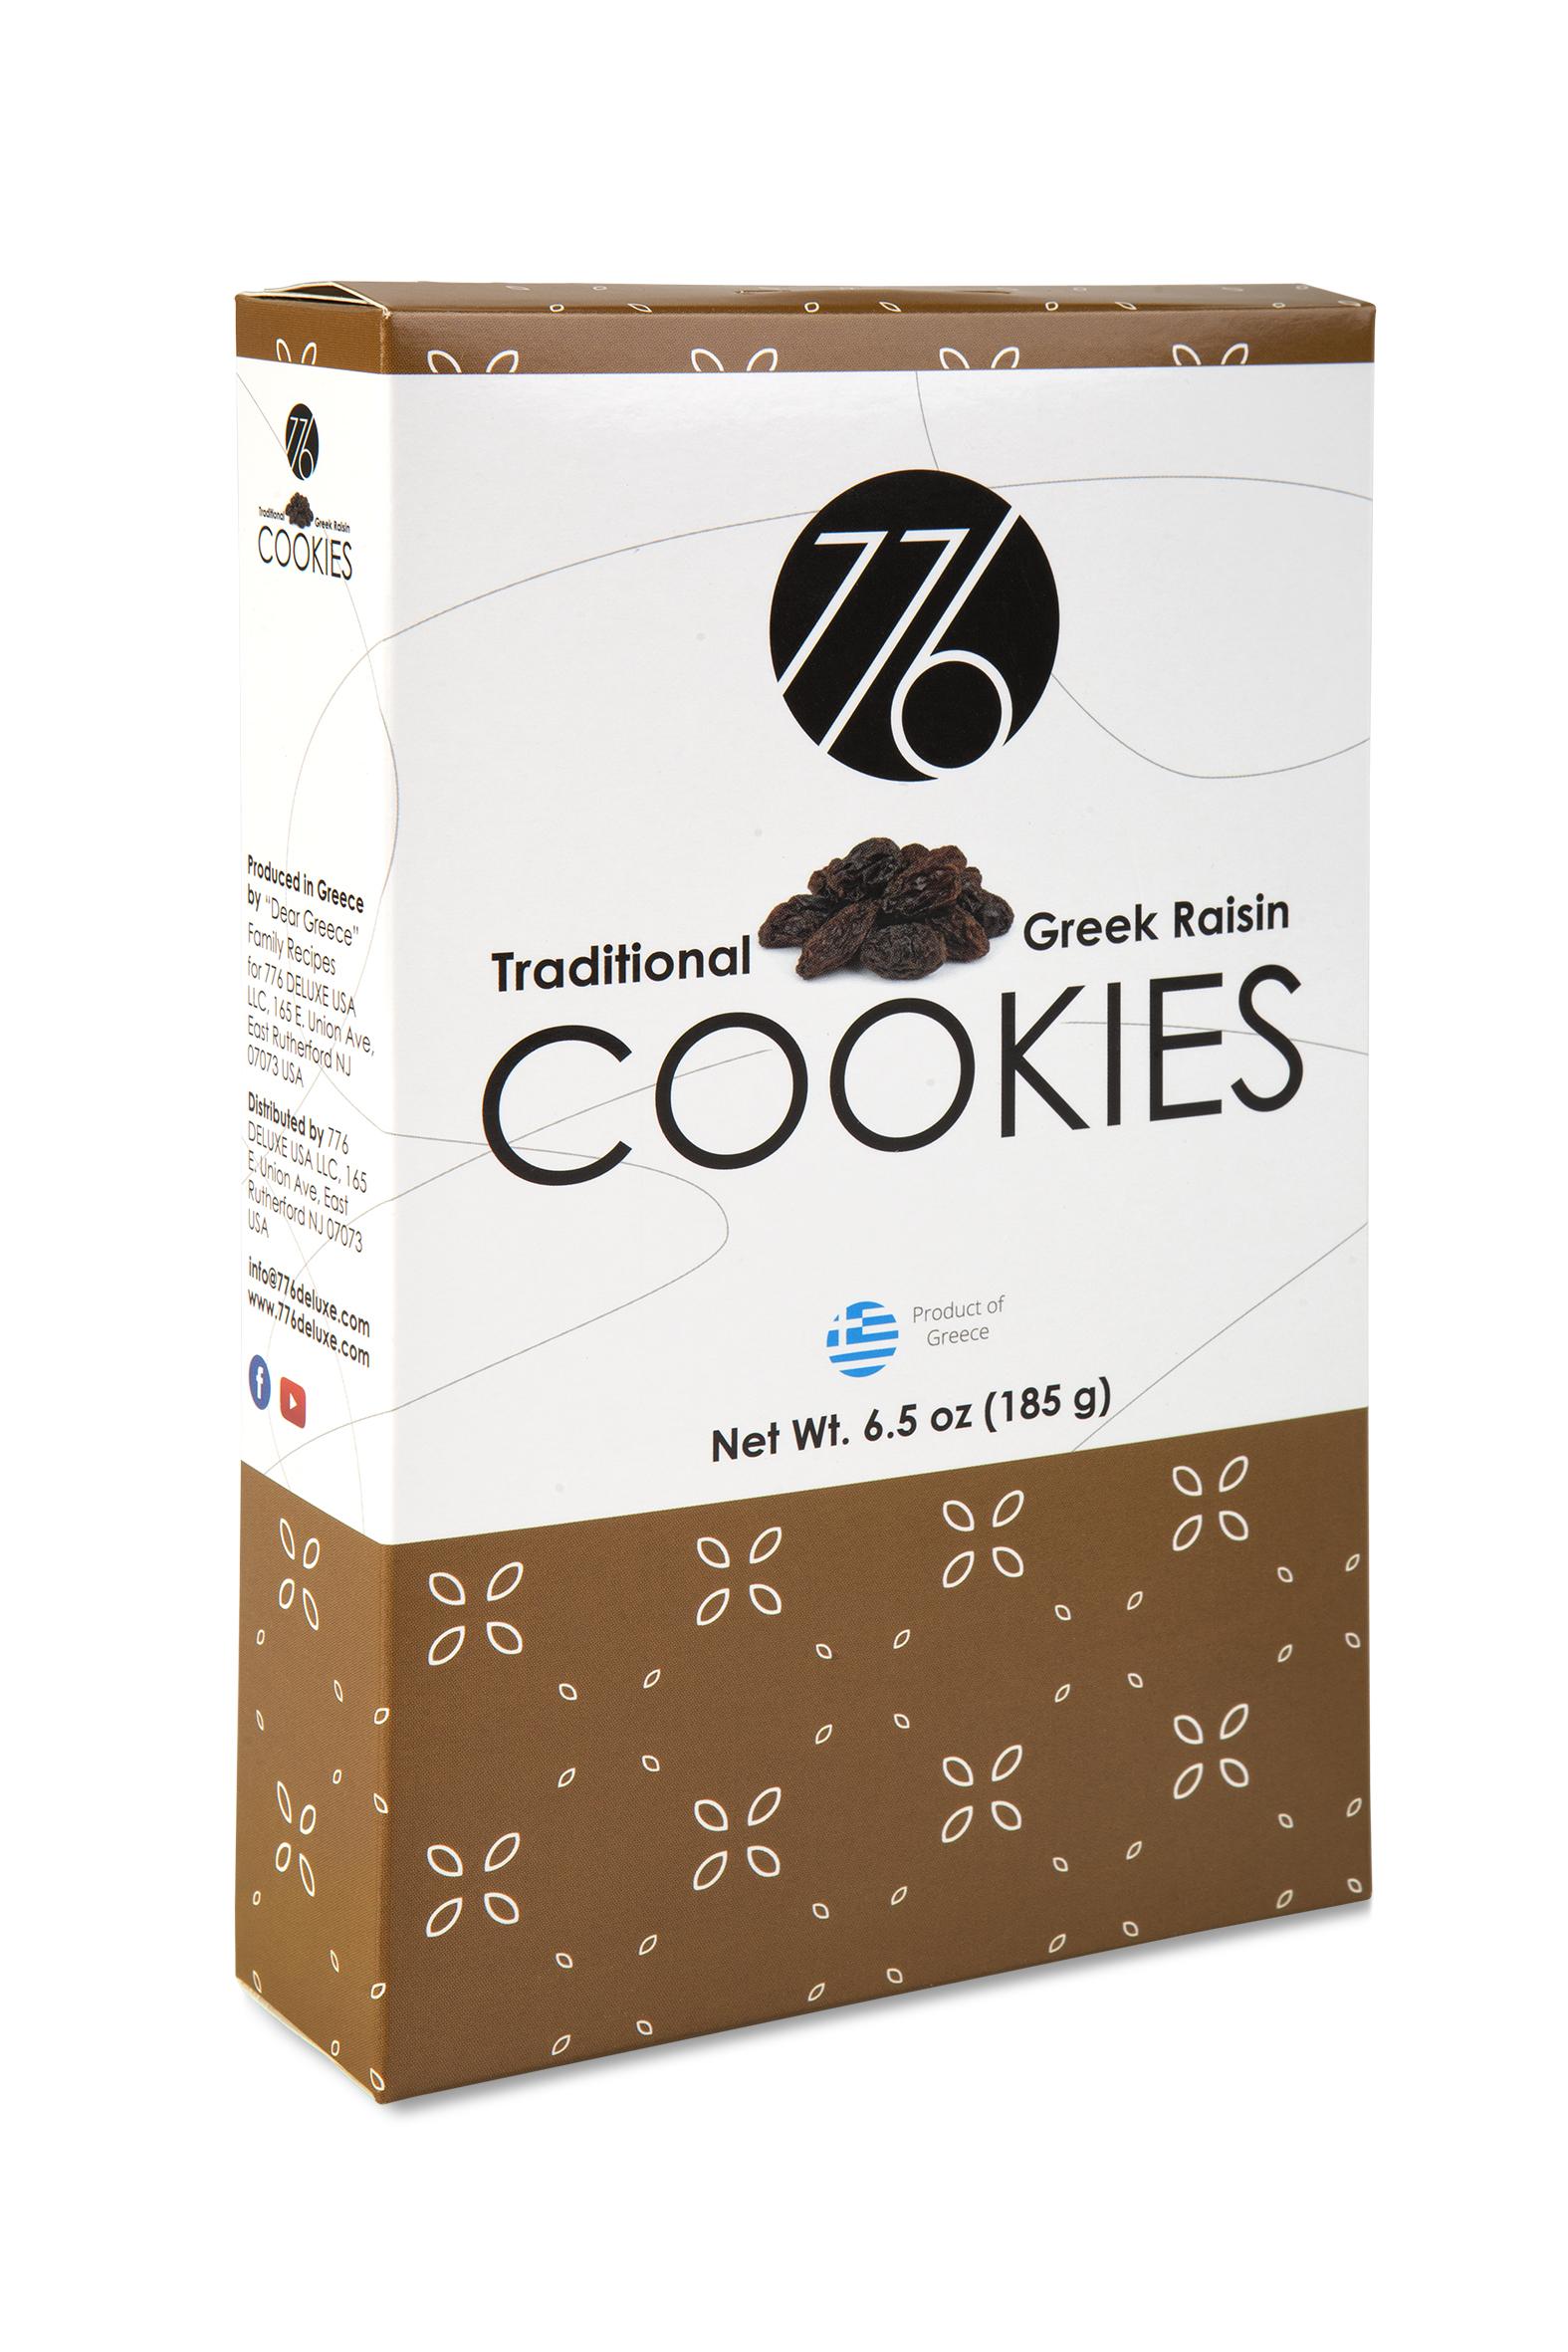 Traditional Greek Raisin Cookies